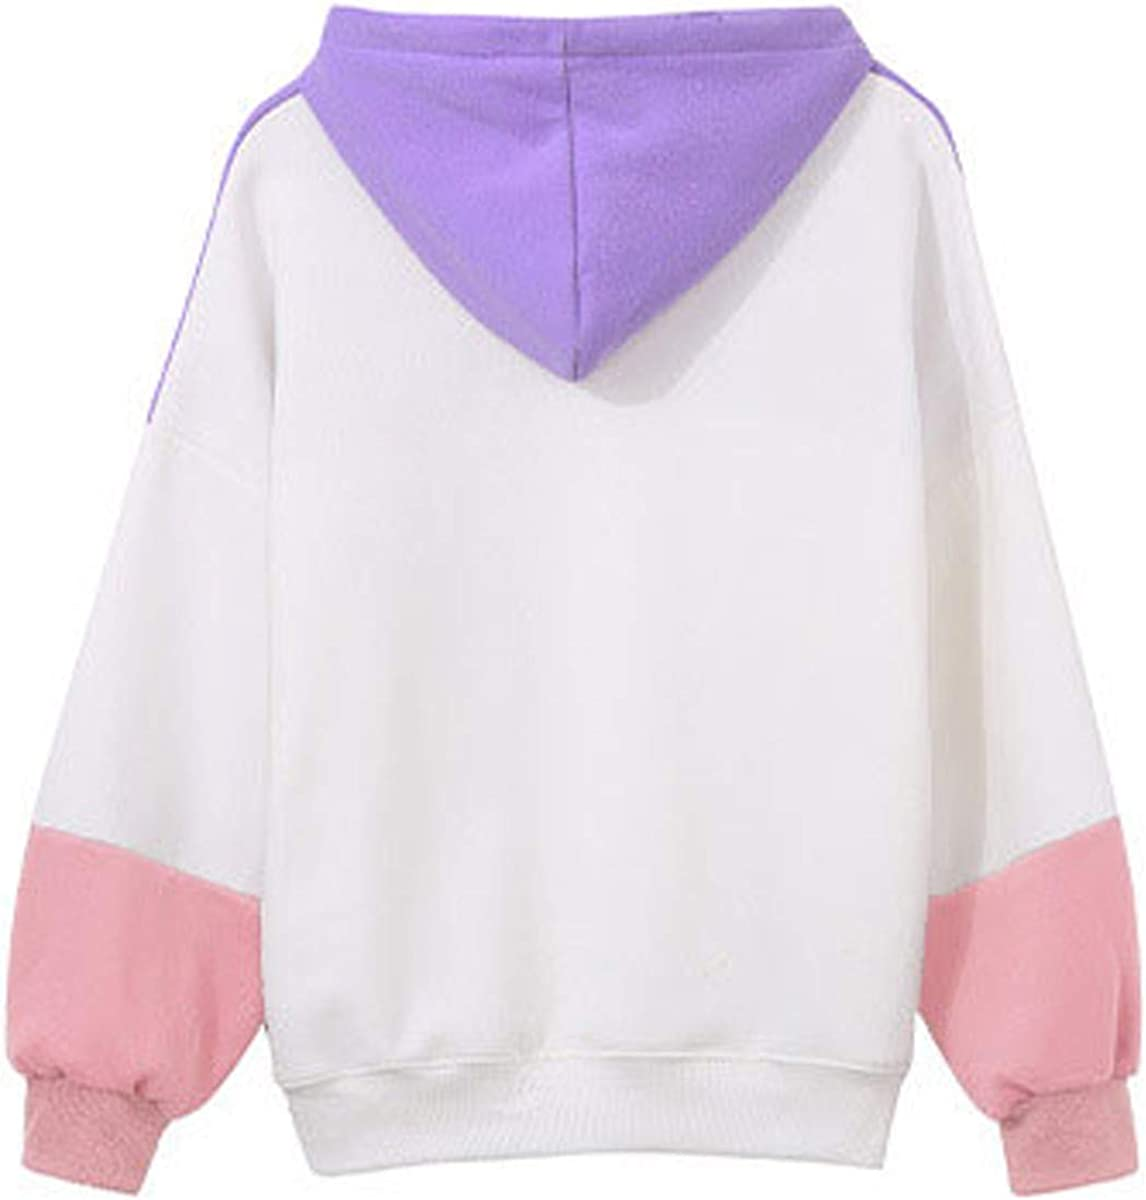 LUCAMORE Womens Casual Hoodie Tricolor Pacthwork Long Sleeve Sweatshirt Hooded Tops Blouse